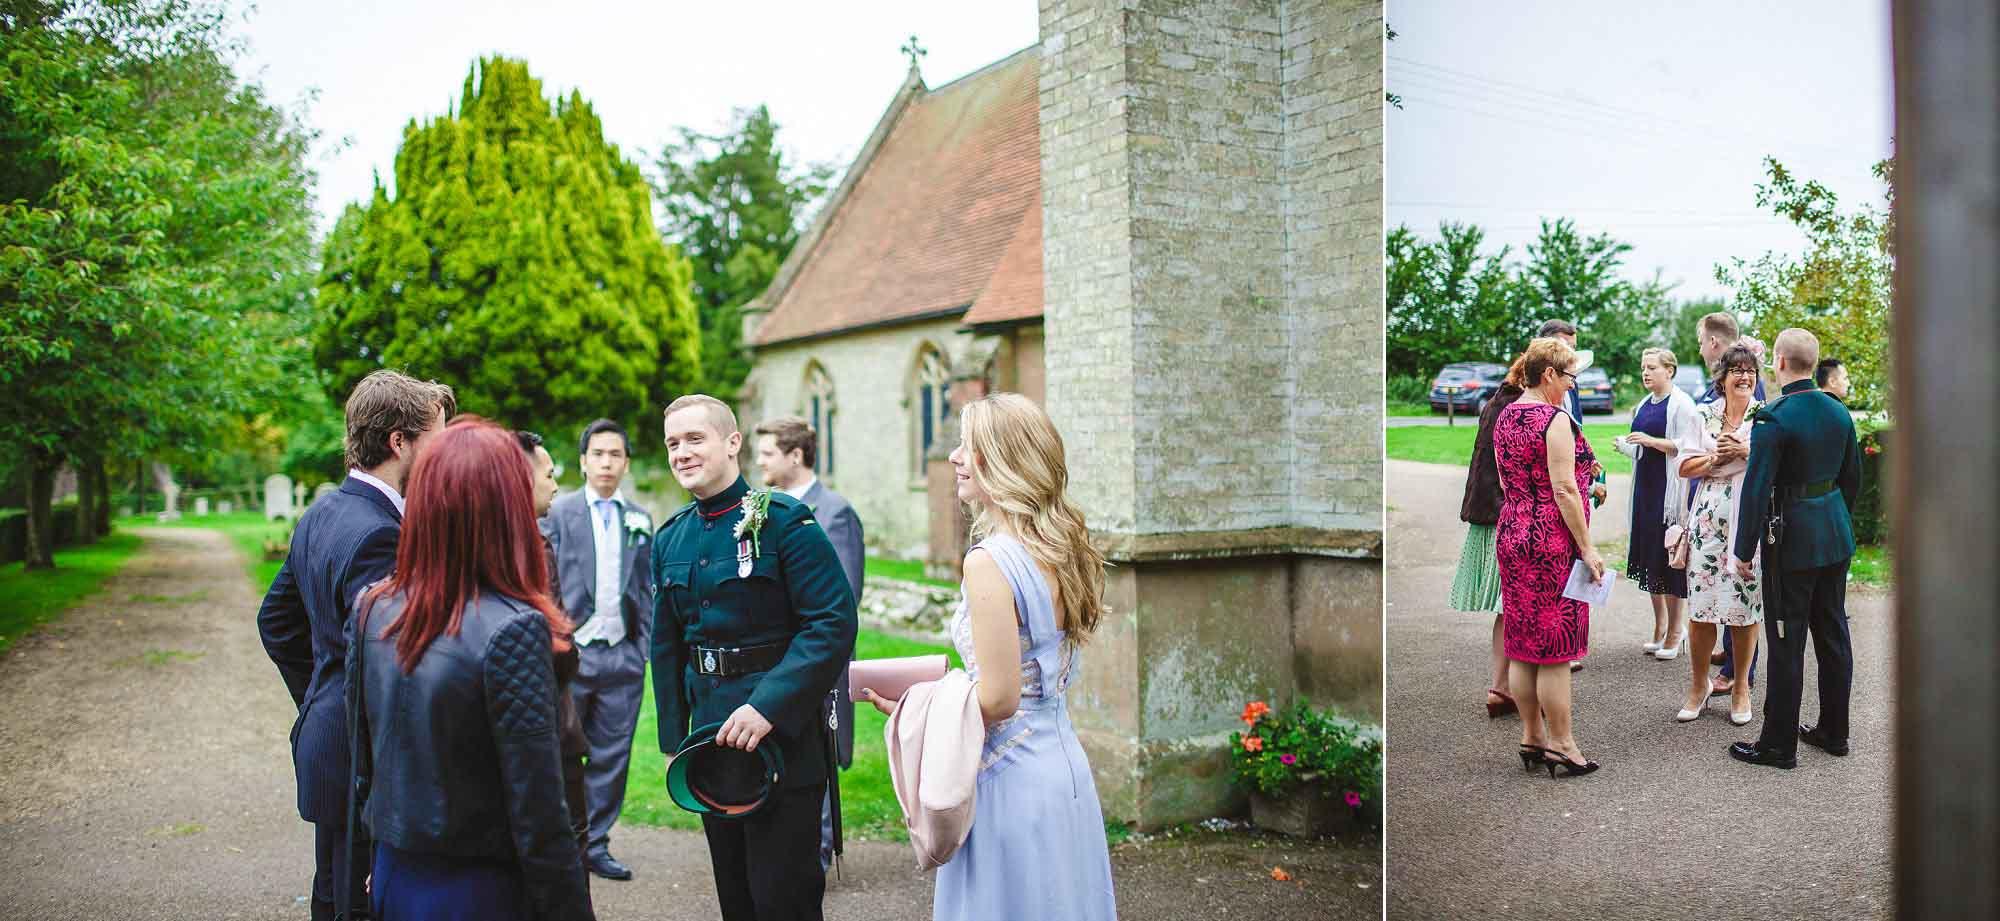 Blake-Hall-Wedding-Photographer_0041.jpg